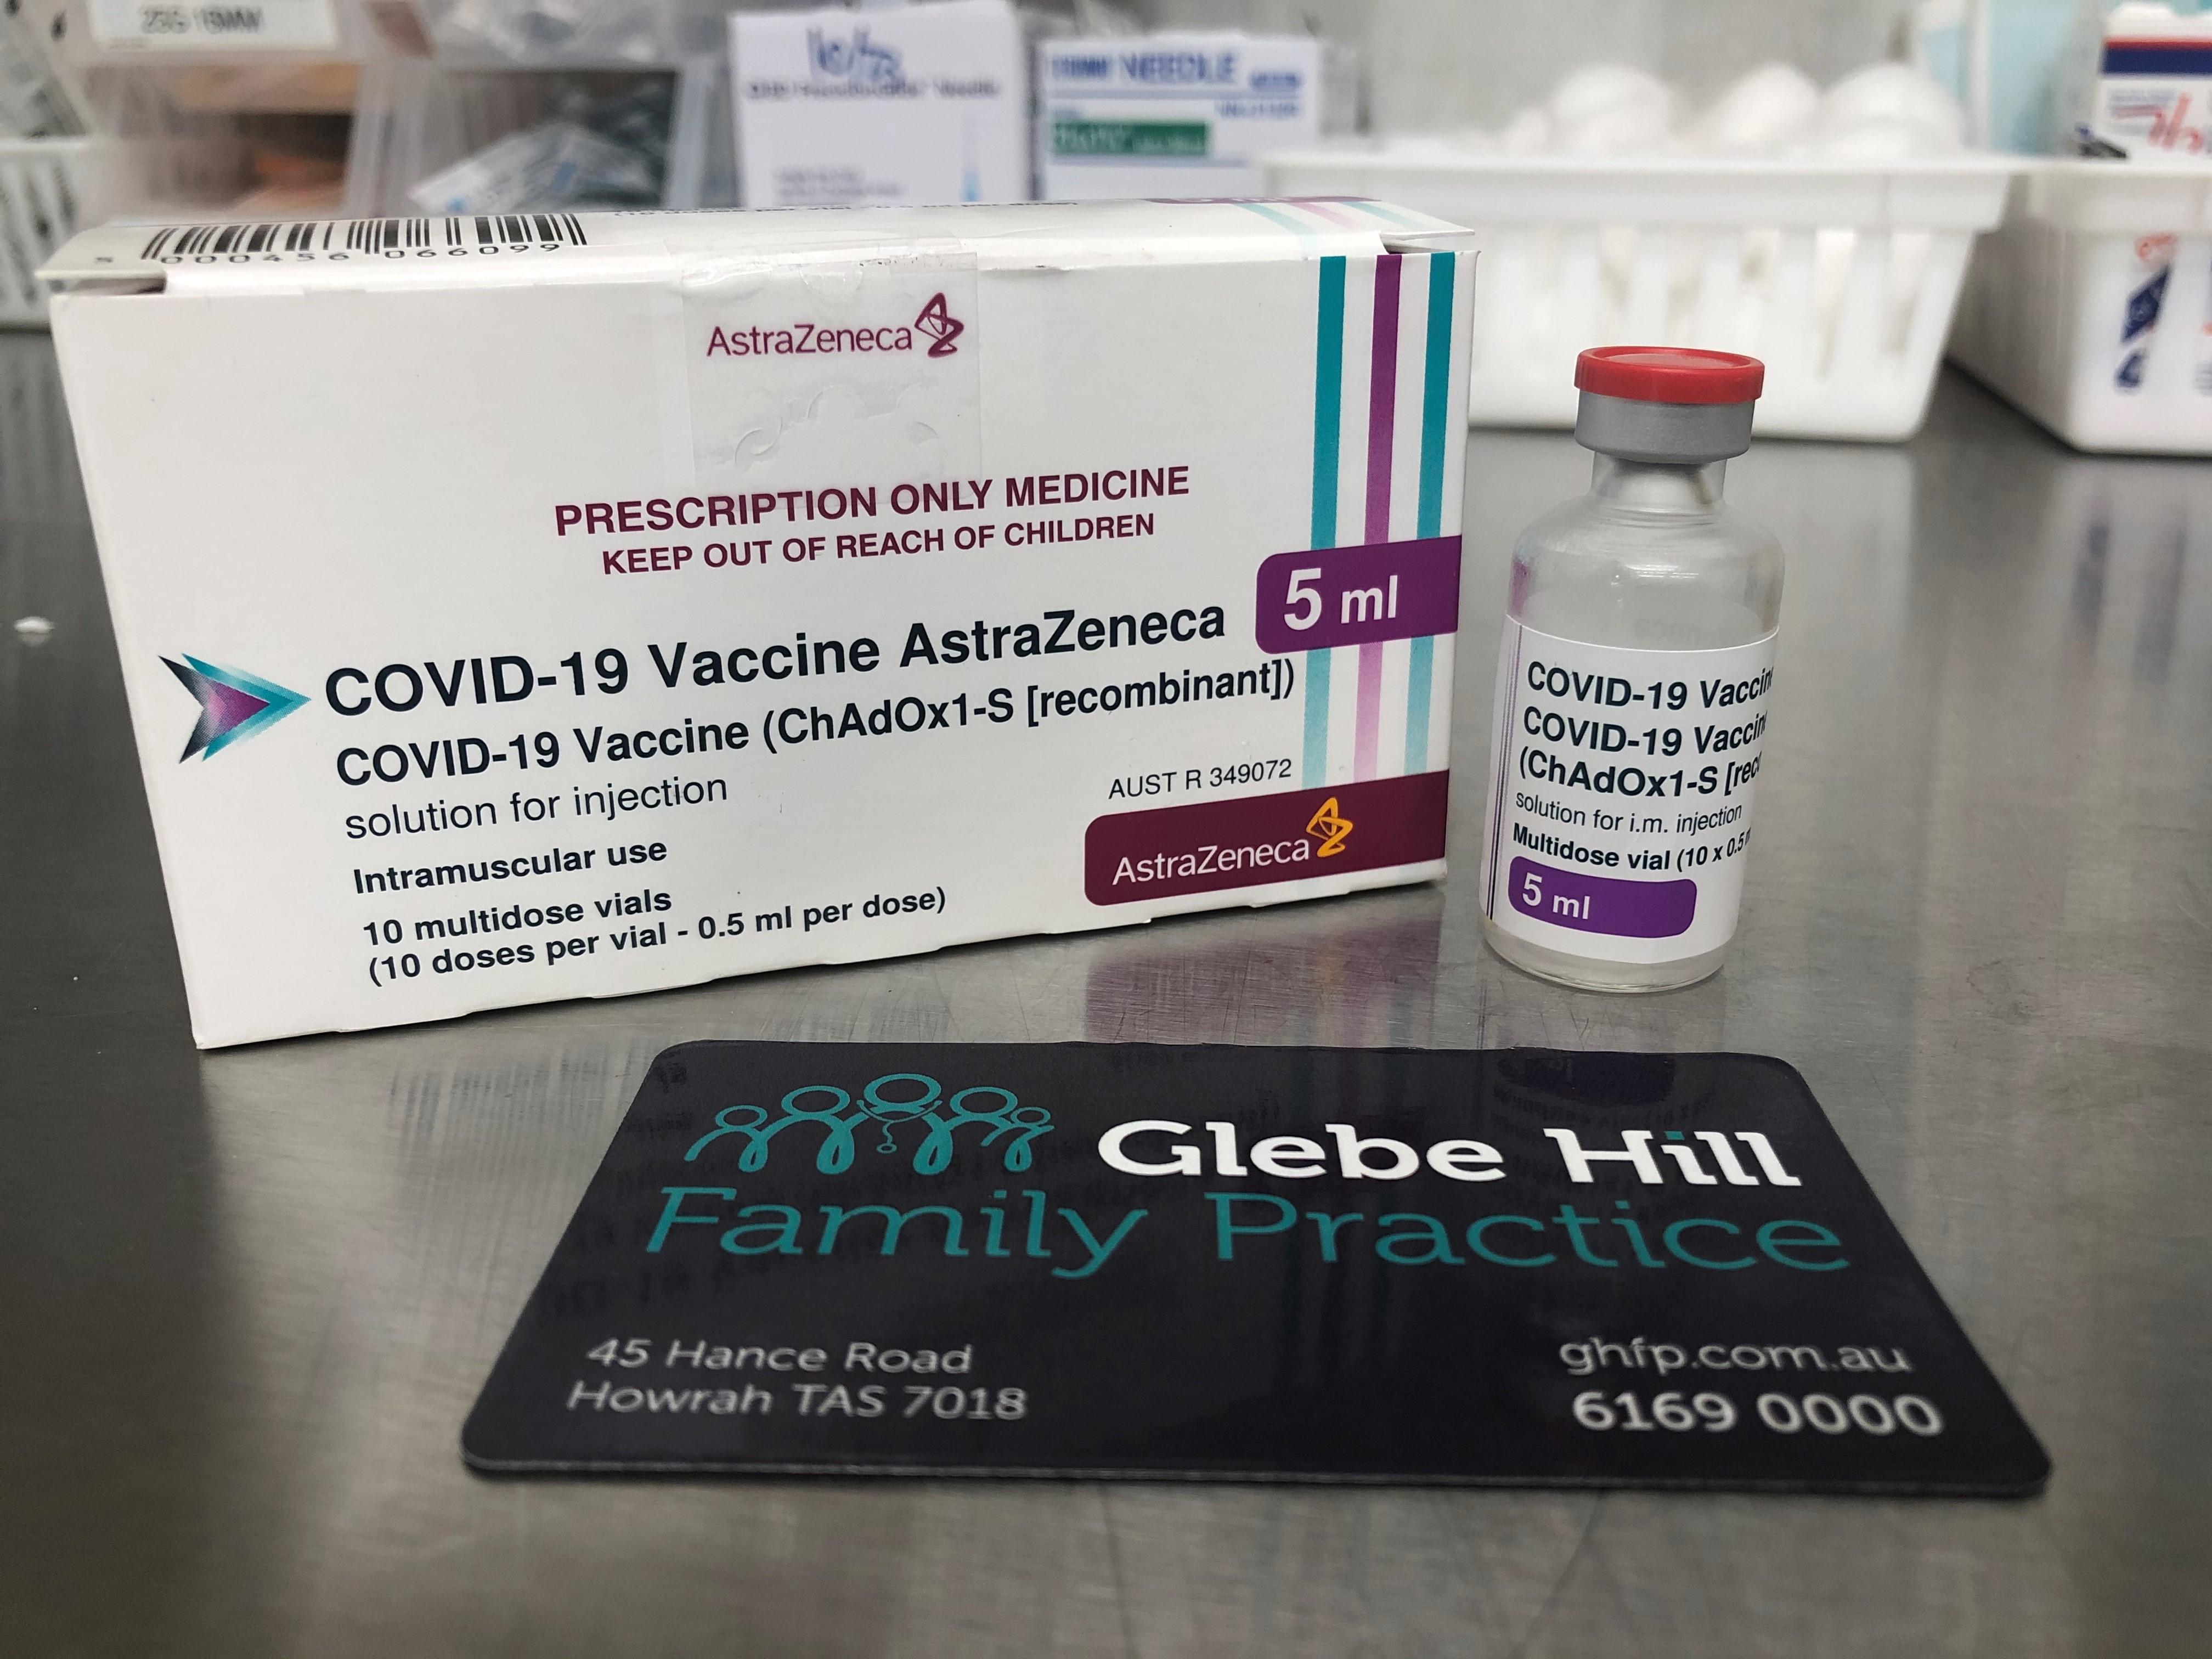 Glebe Hill Family Practice - Covid-19 Vaccine